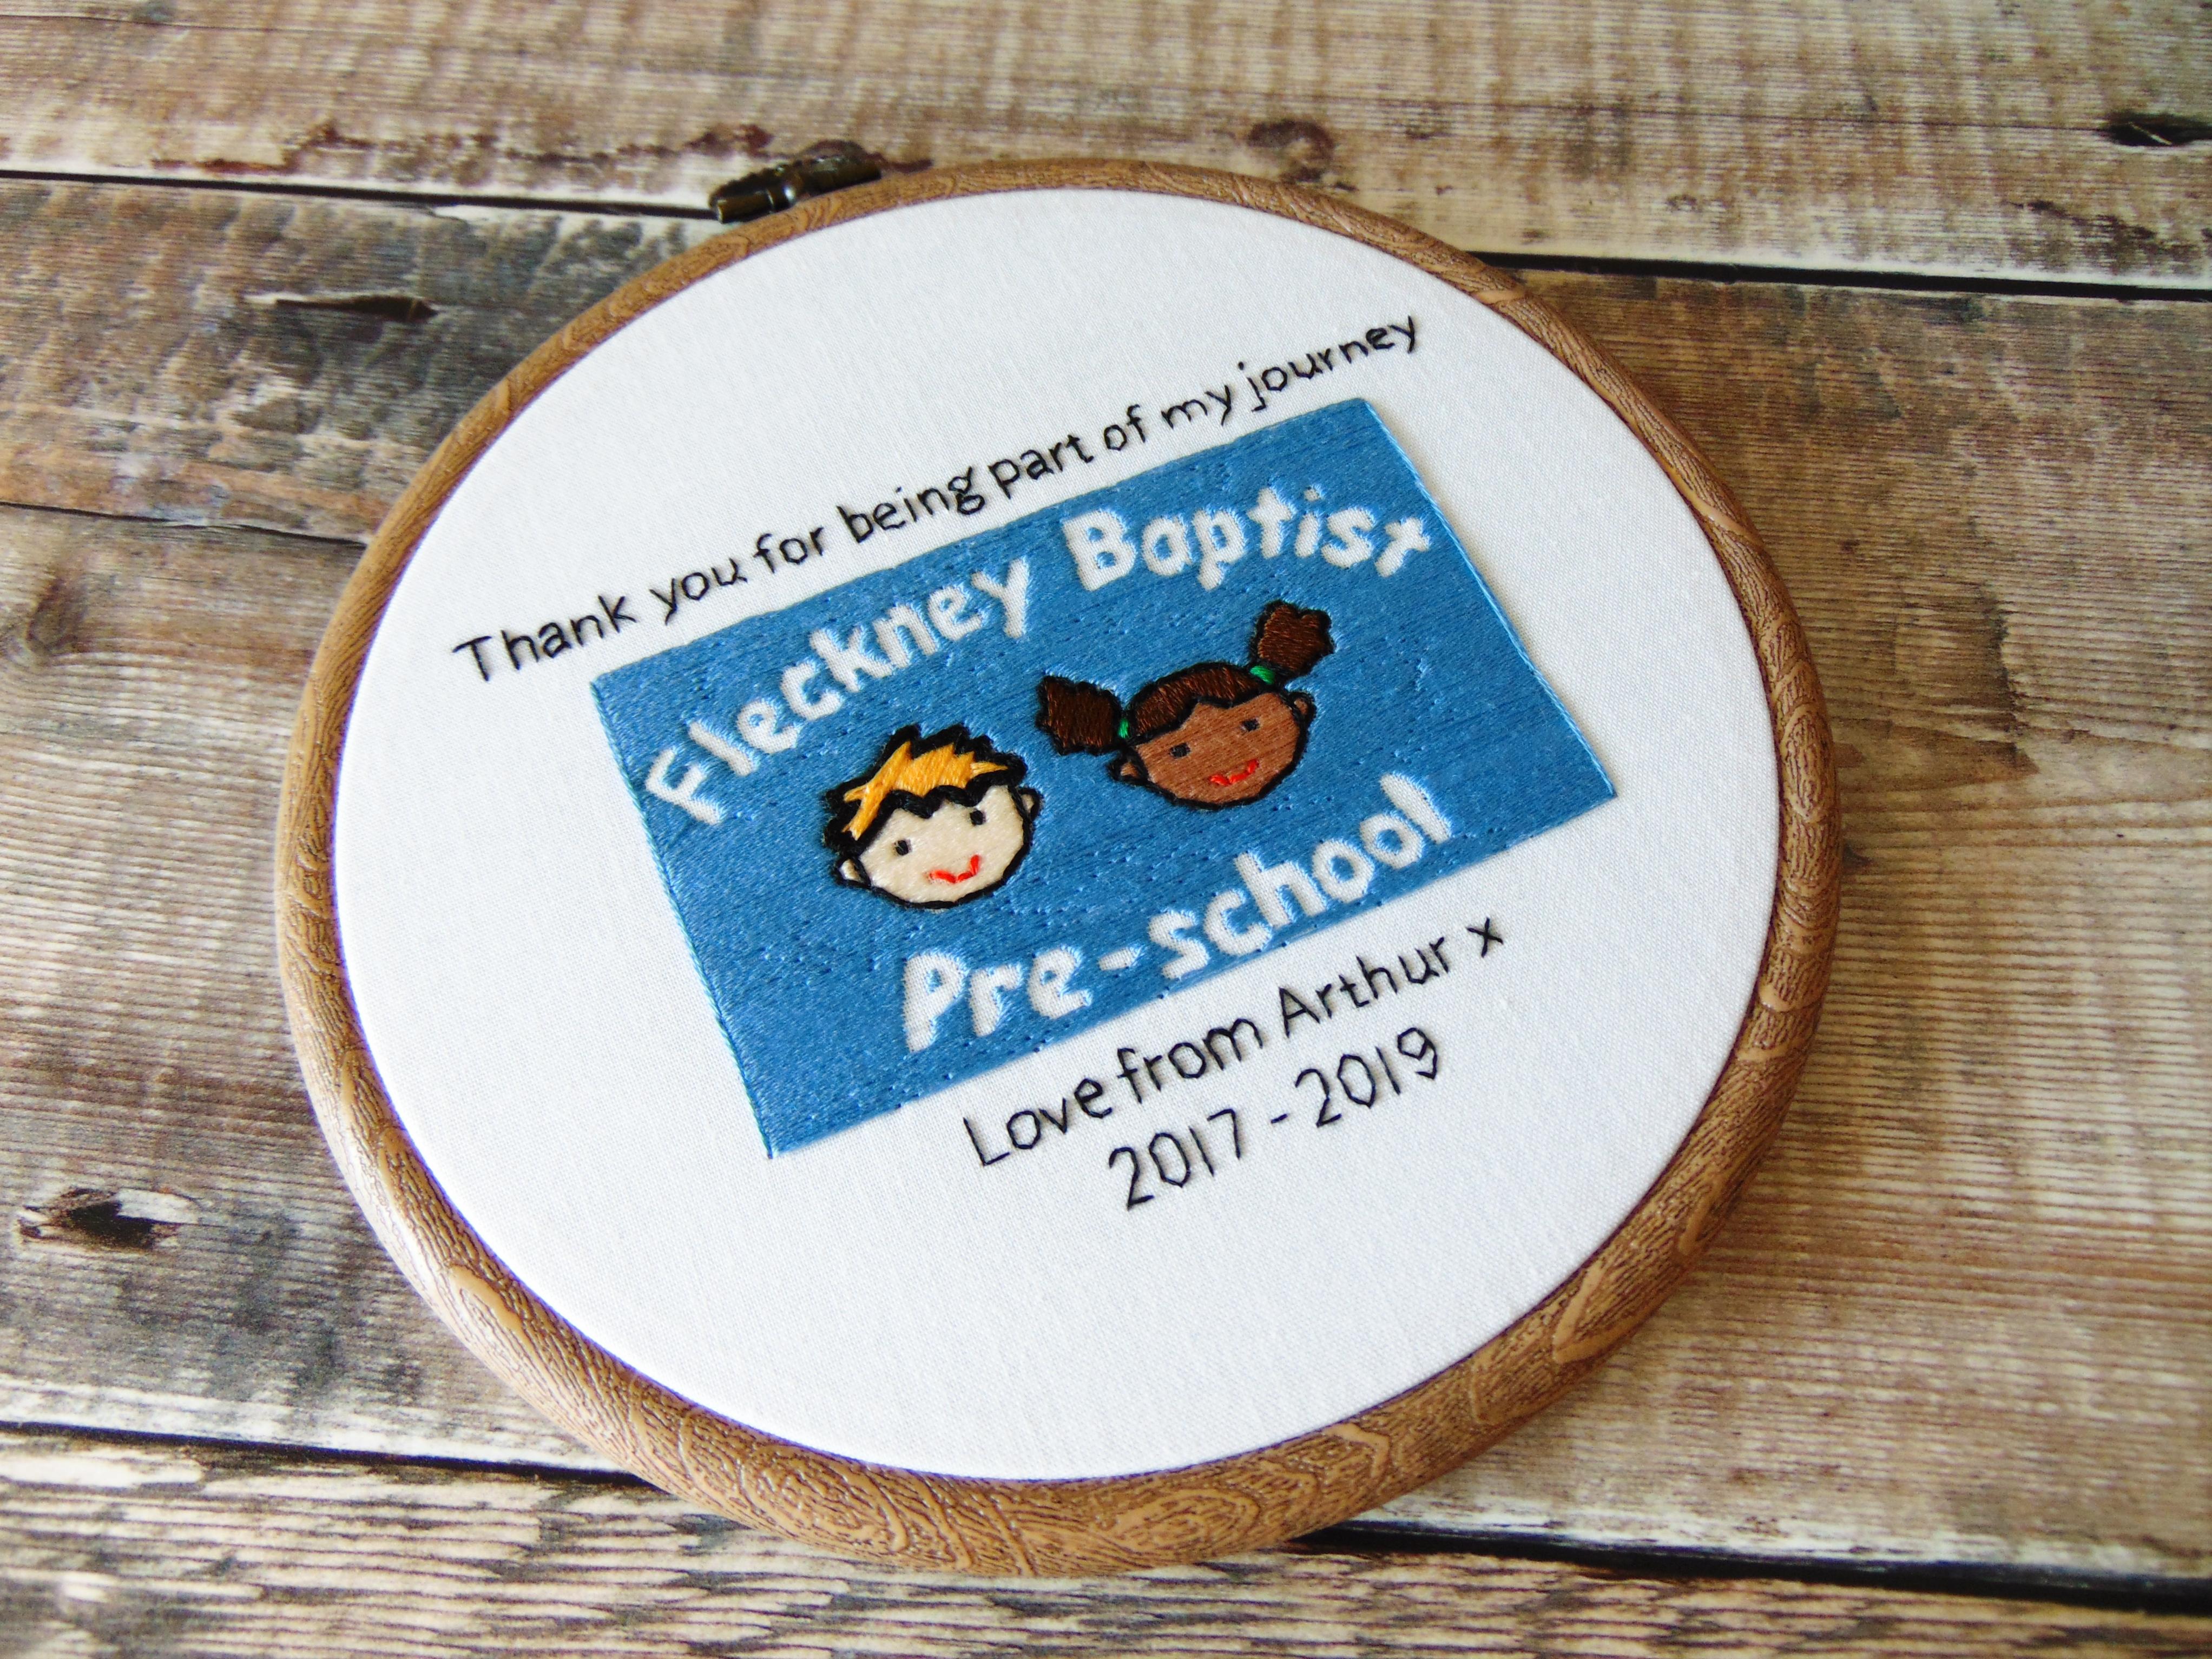 Nursery Logo - Fleckney Baptist 2